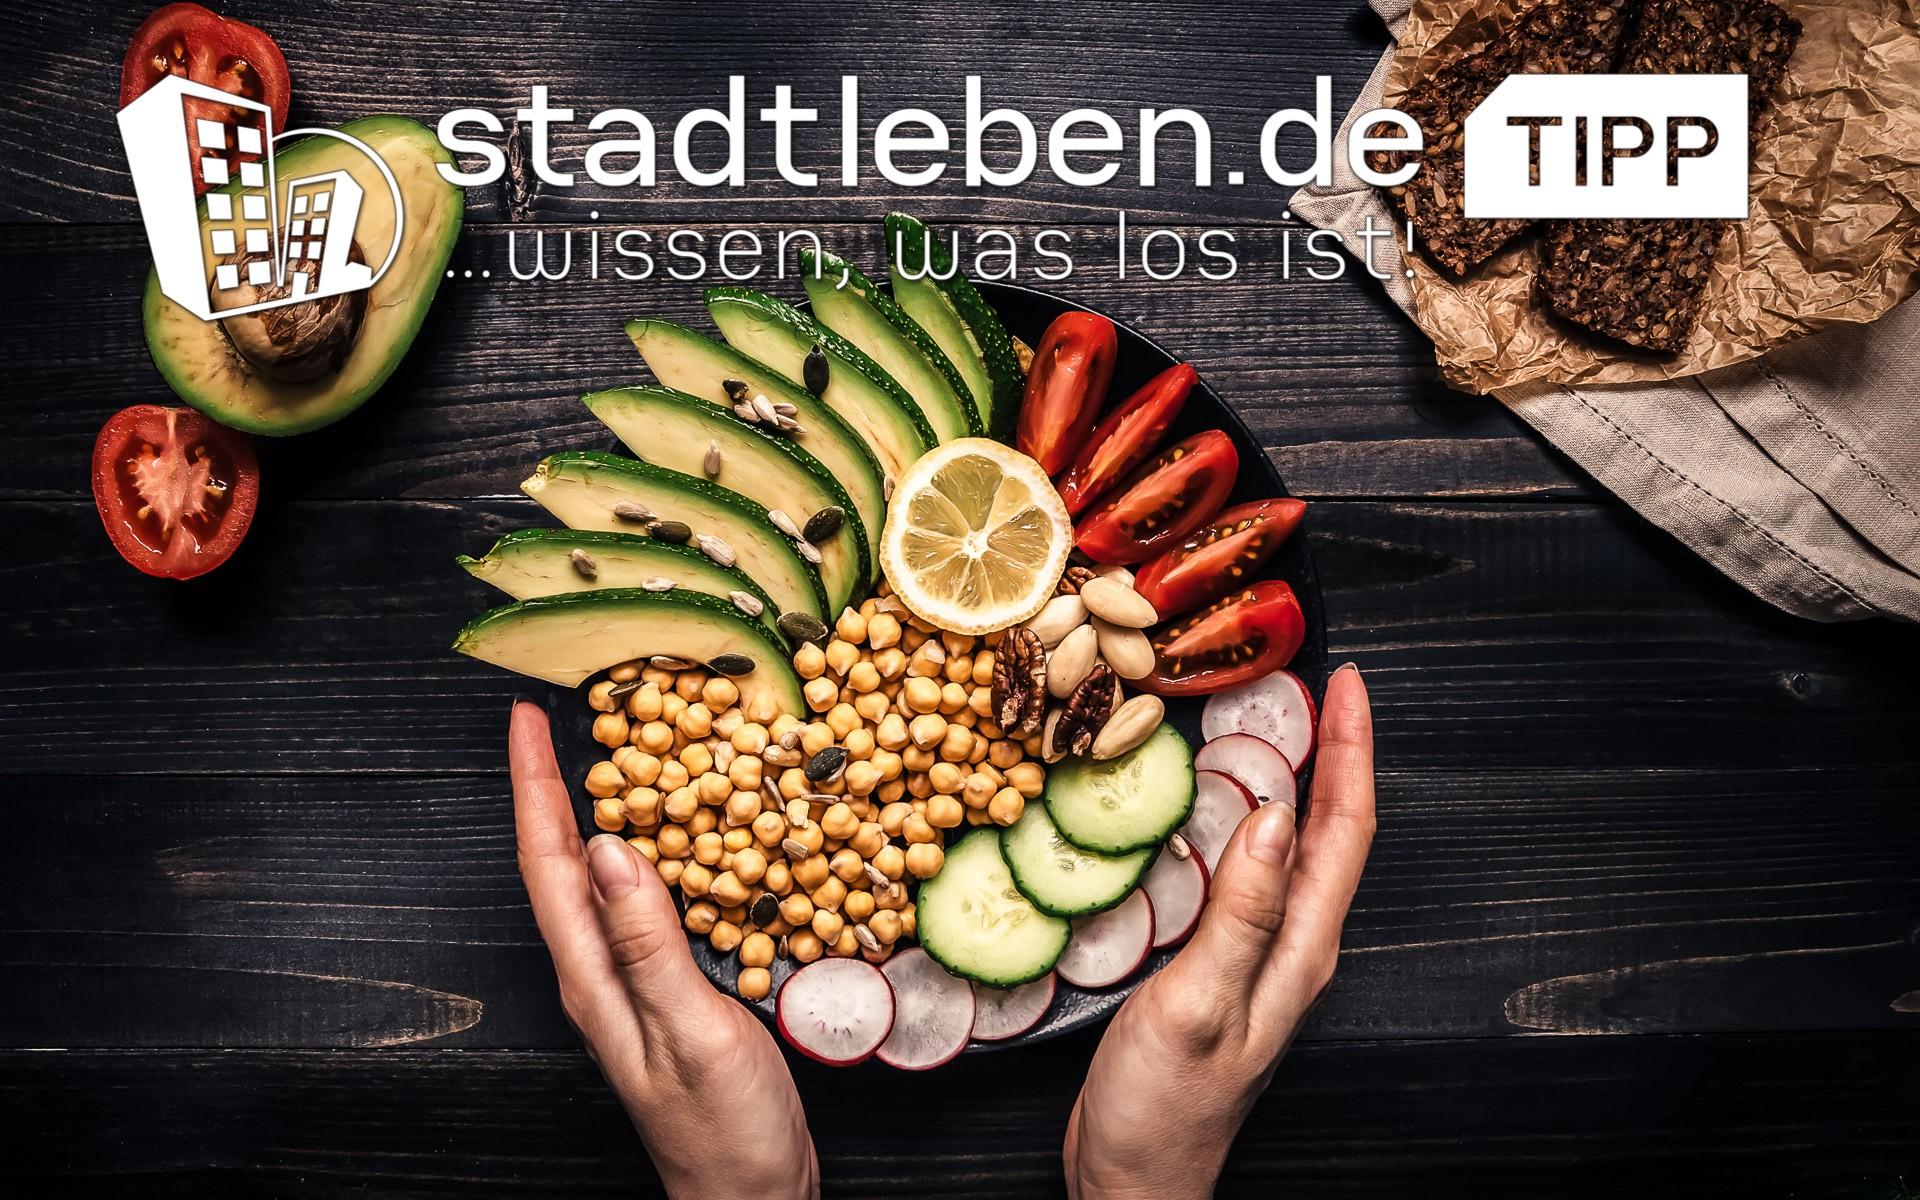 Gurken, Gemüse, Kichererbsen, Avocado, Zitrone, Tomate, Brot, Radieschen